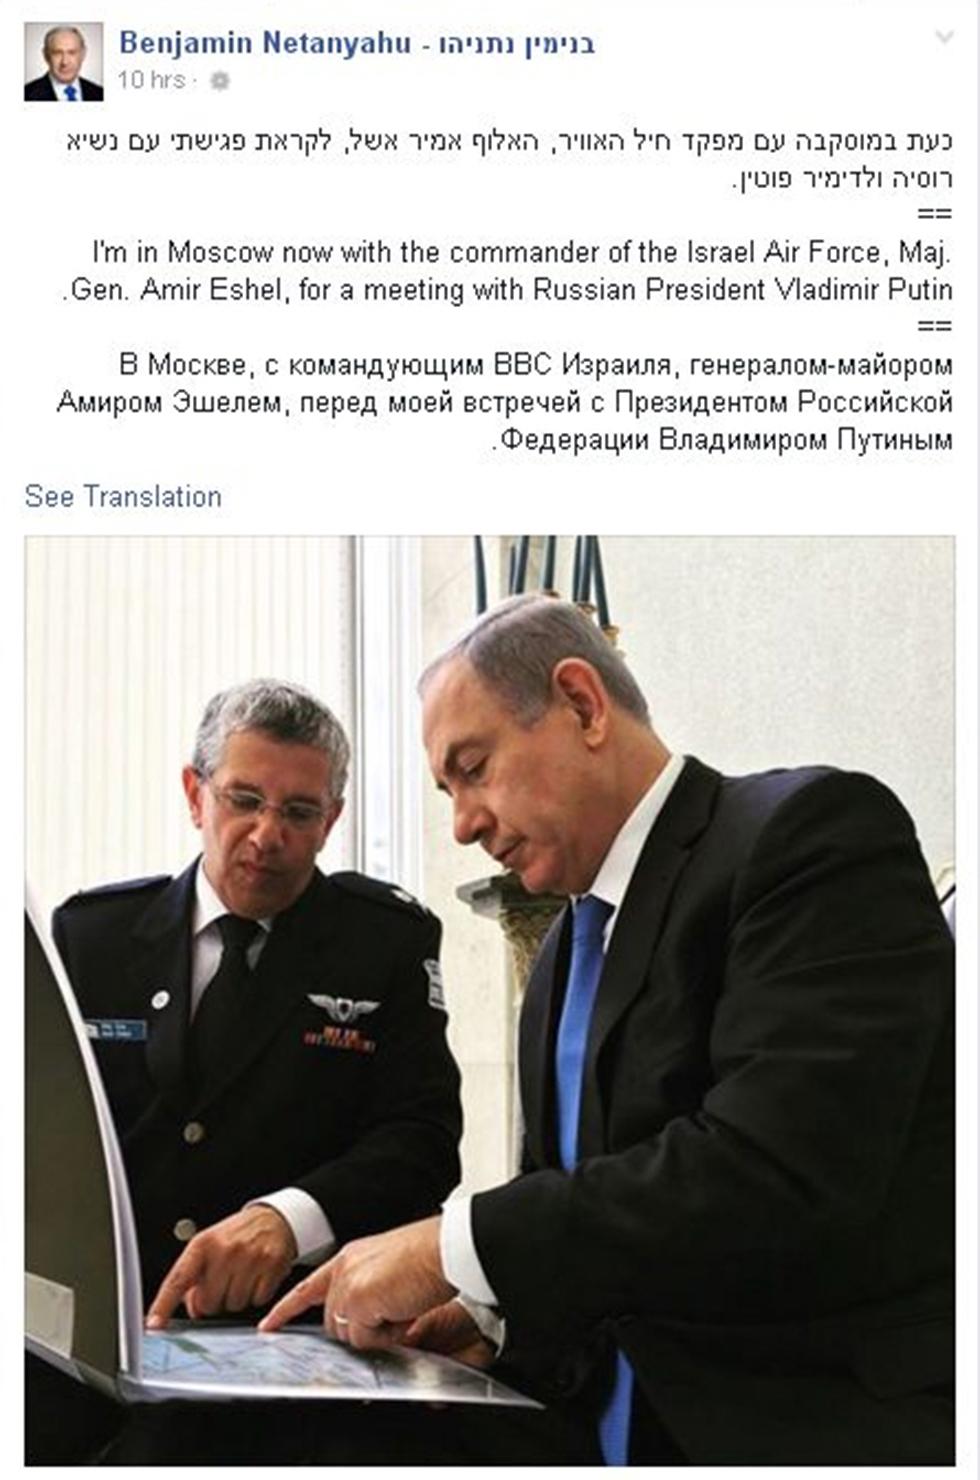 Netanyahu in Moscow with Air Force Commander Amir Eshel.